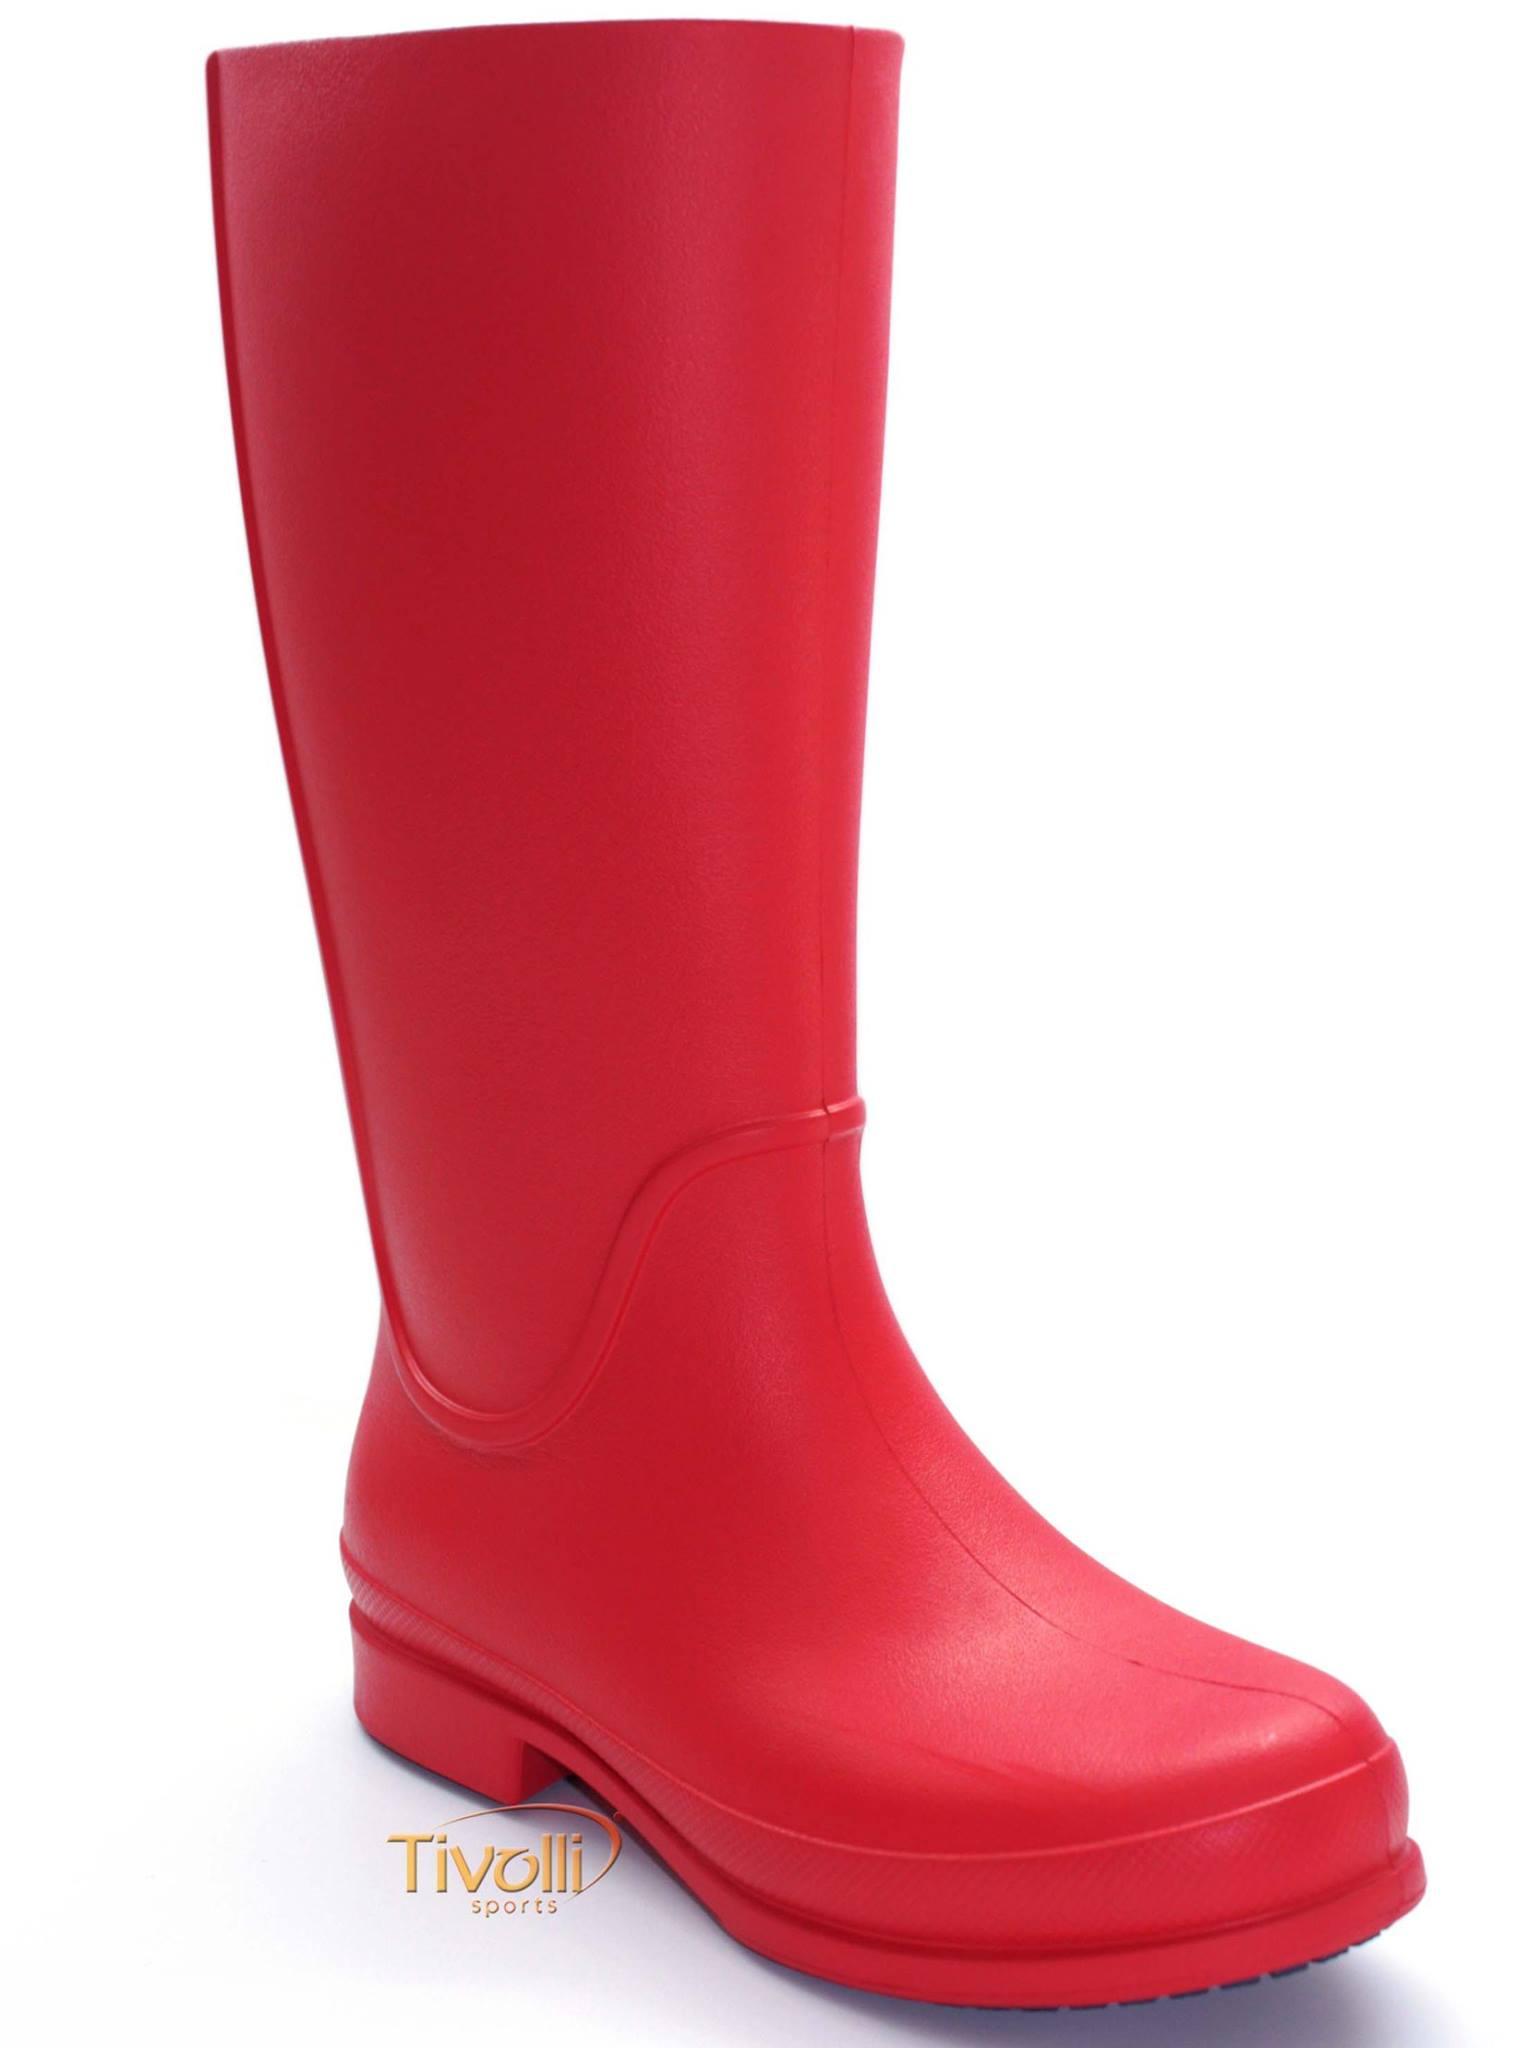 4b196b409a3 Galocha Crocs Wellie Rain Boot   bota feminina rosa